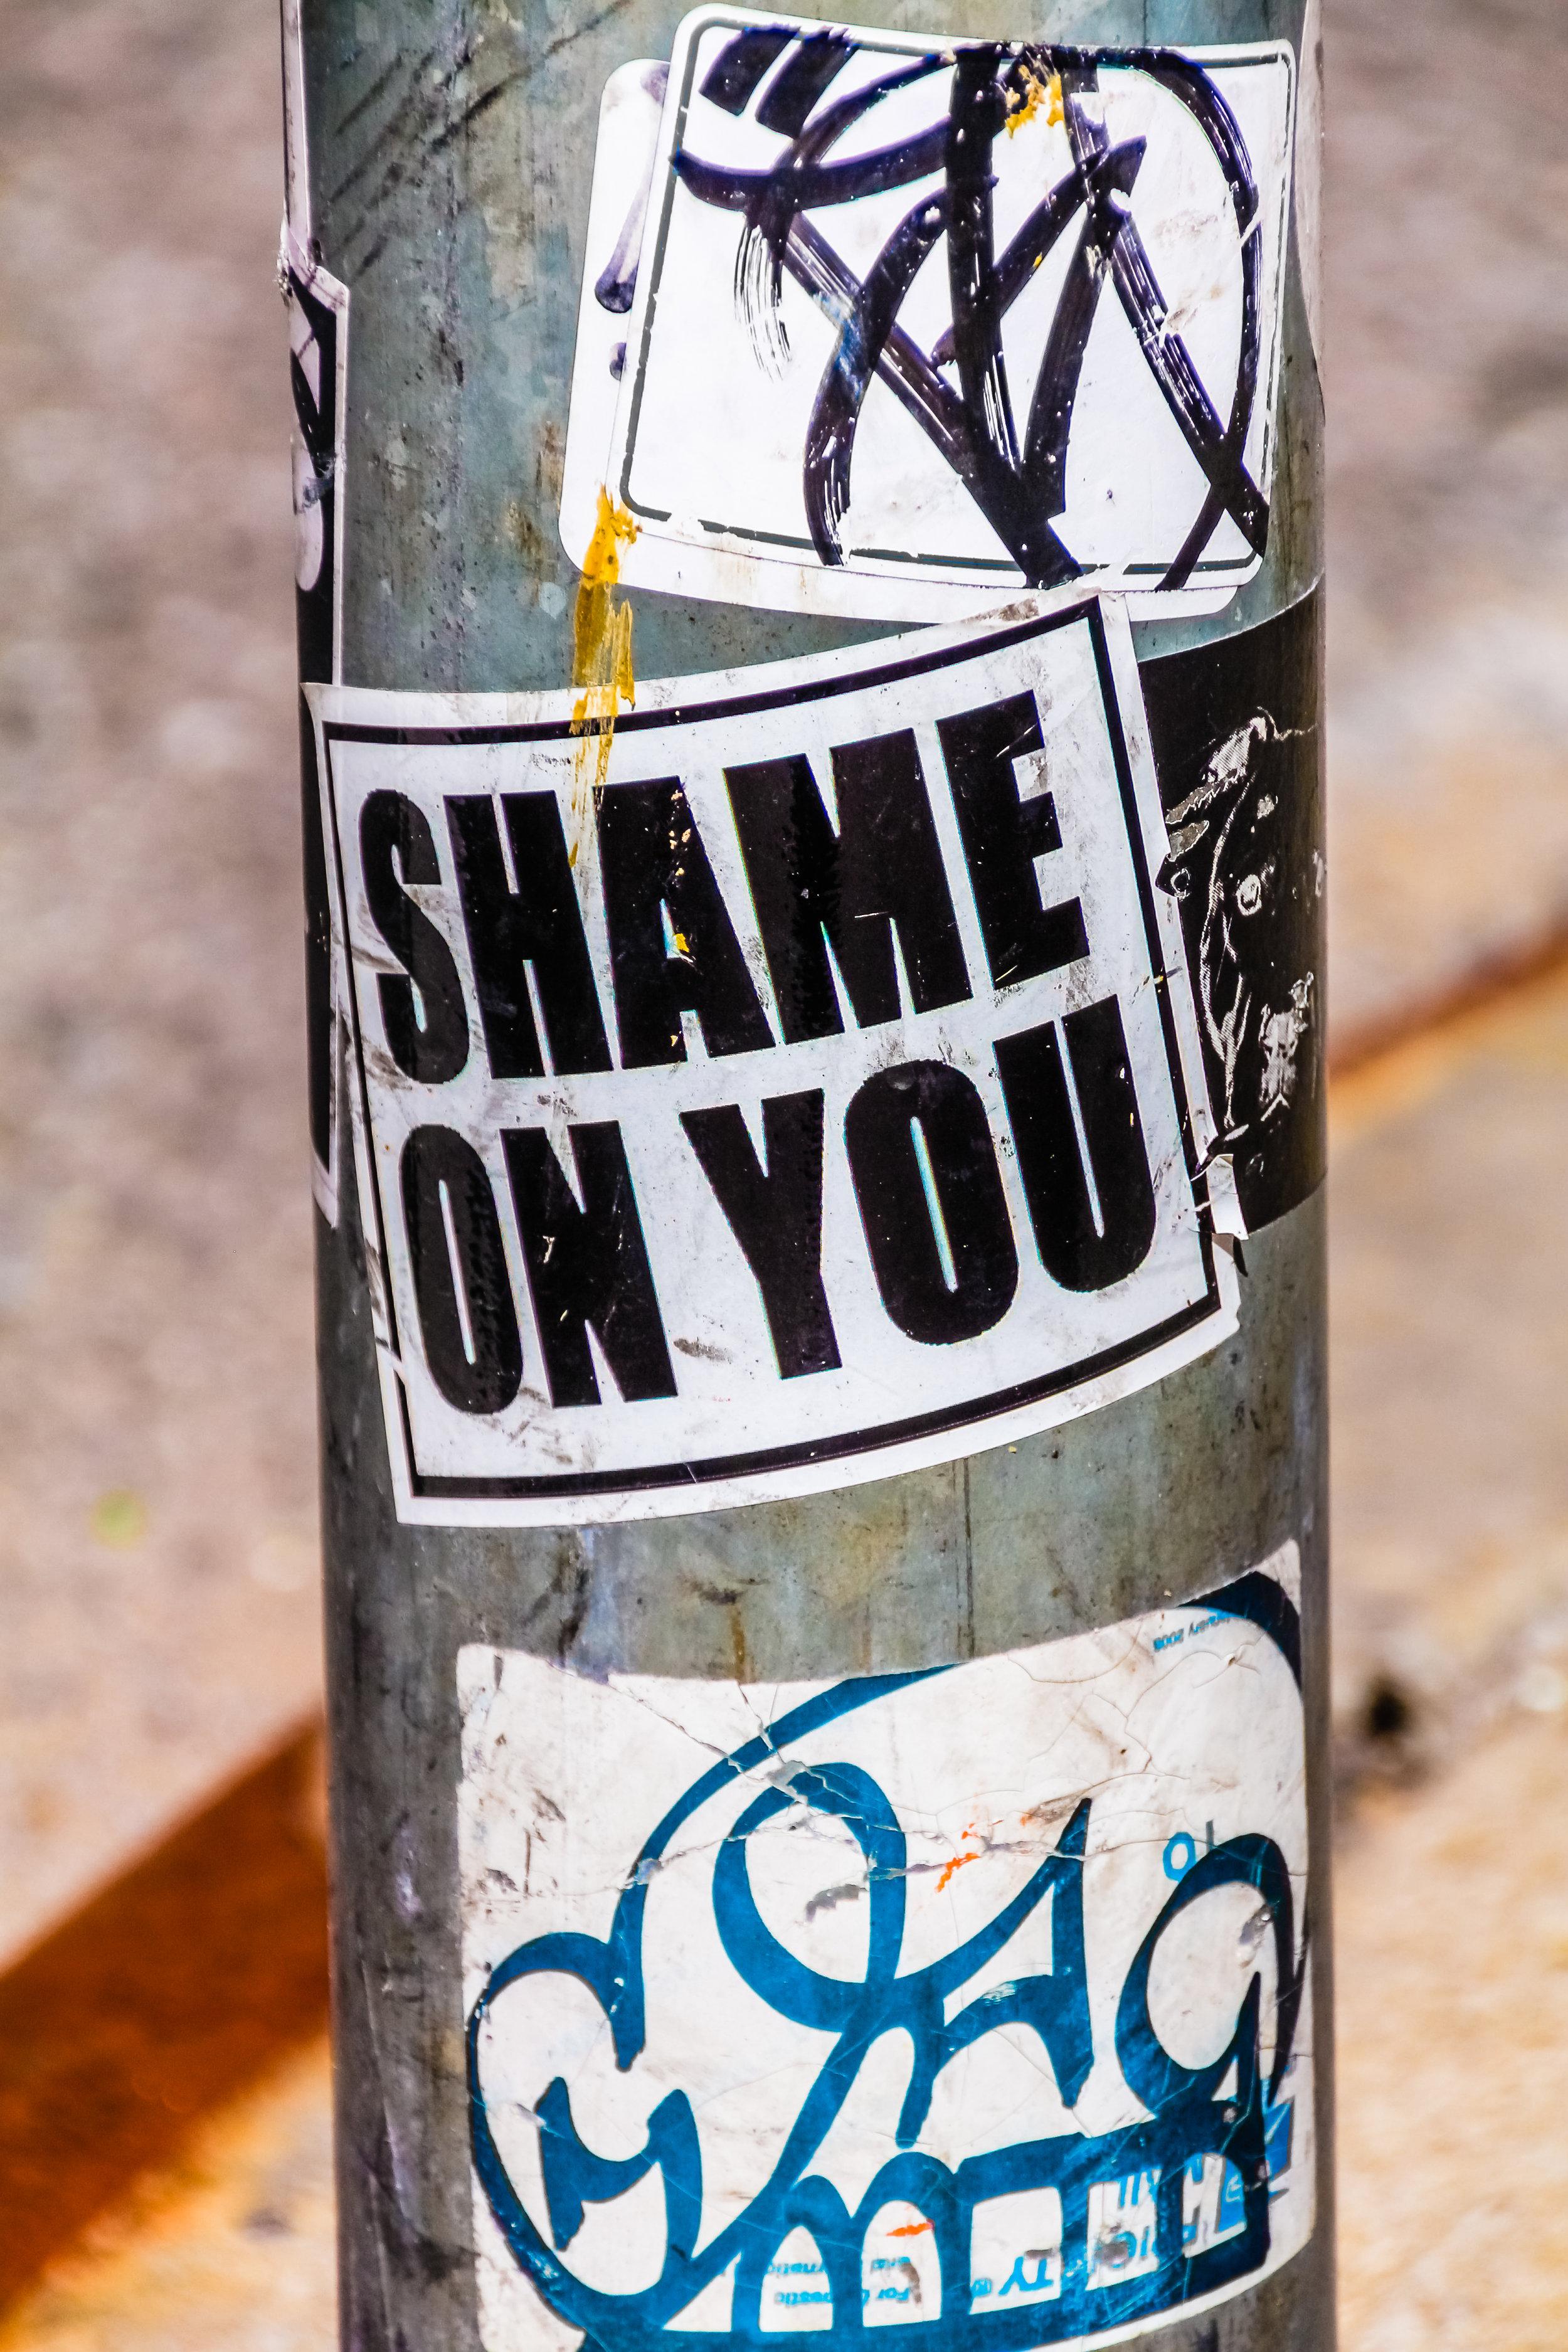 NYC2014-ShameOnYou-1.jpg